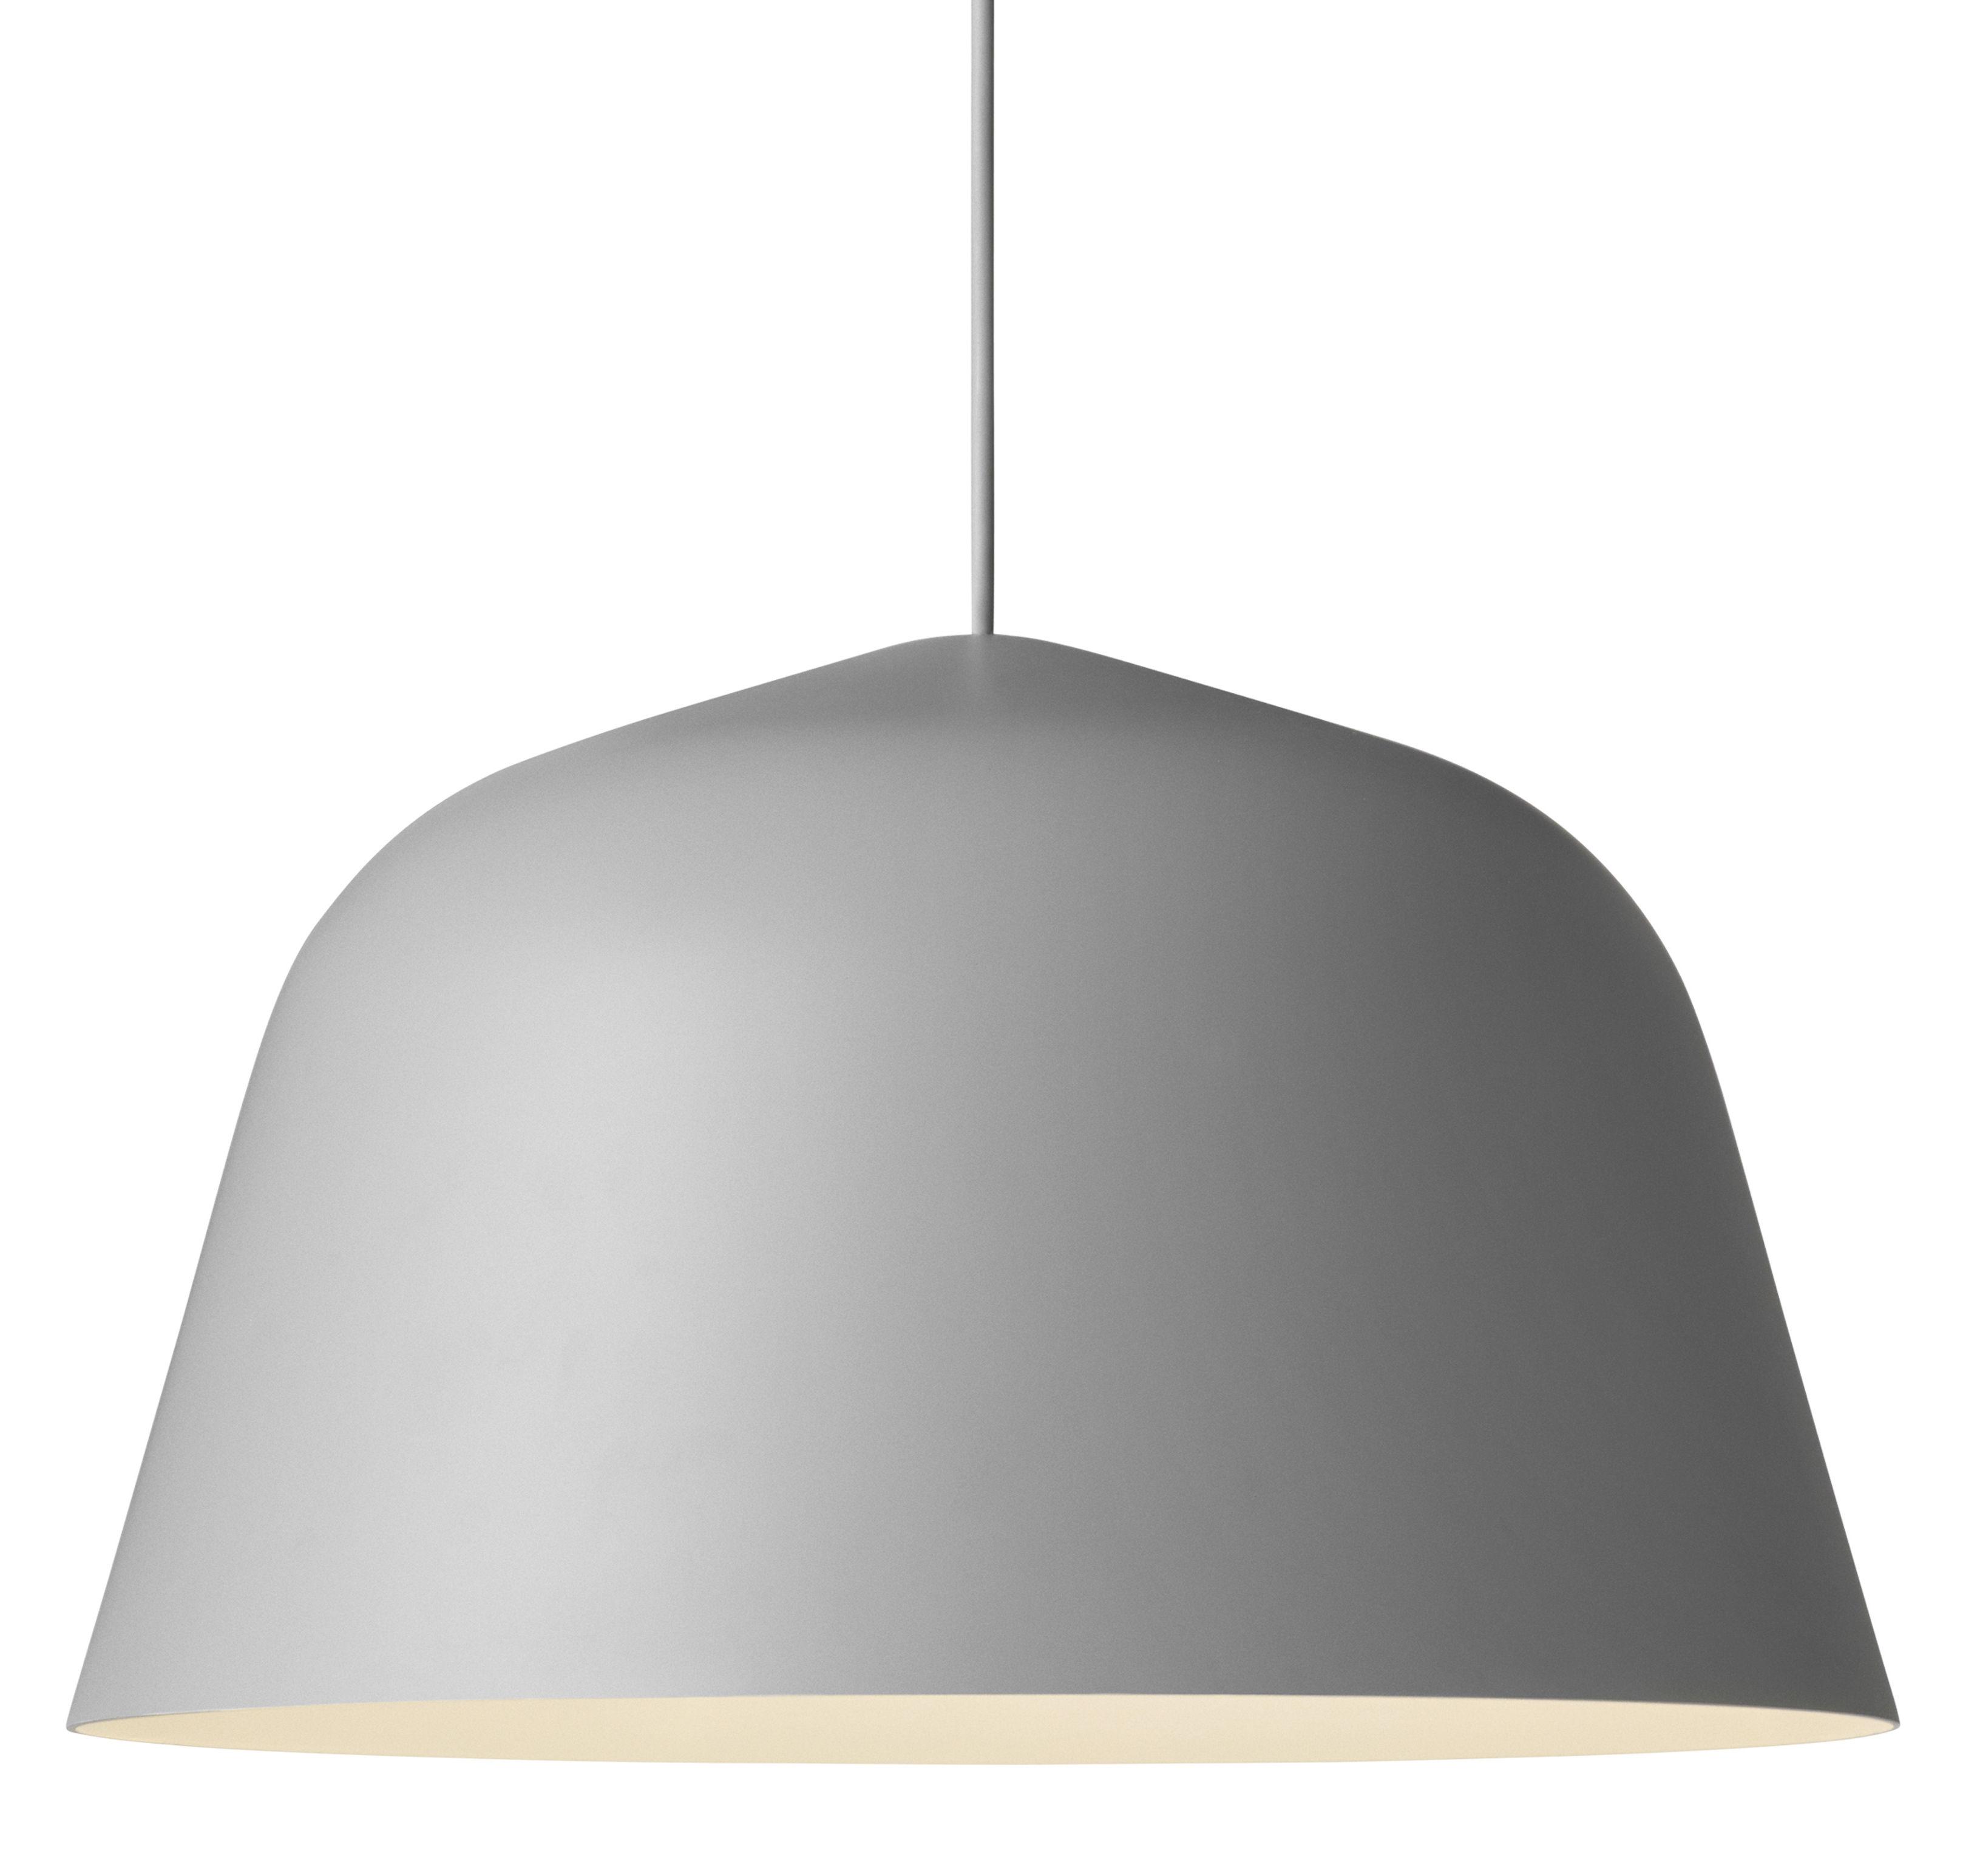 Leuchten - Pendelleuchten - Ambit Pendelleuchte / Ø 40 cm - Muuto - Grau - Aluminium